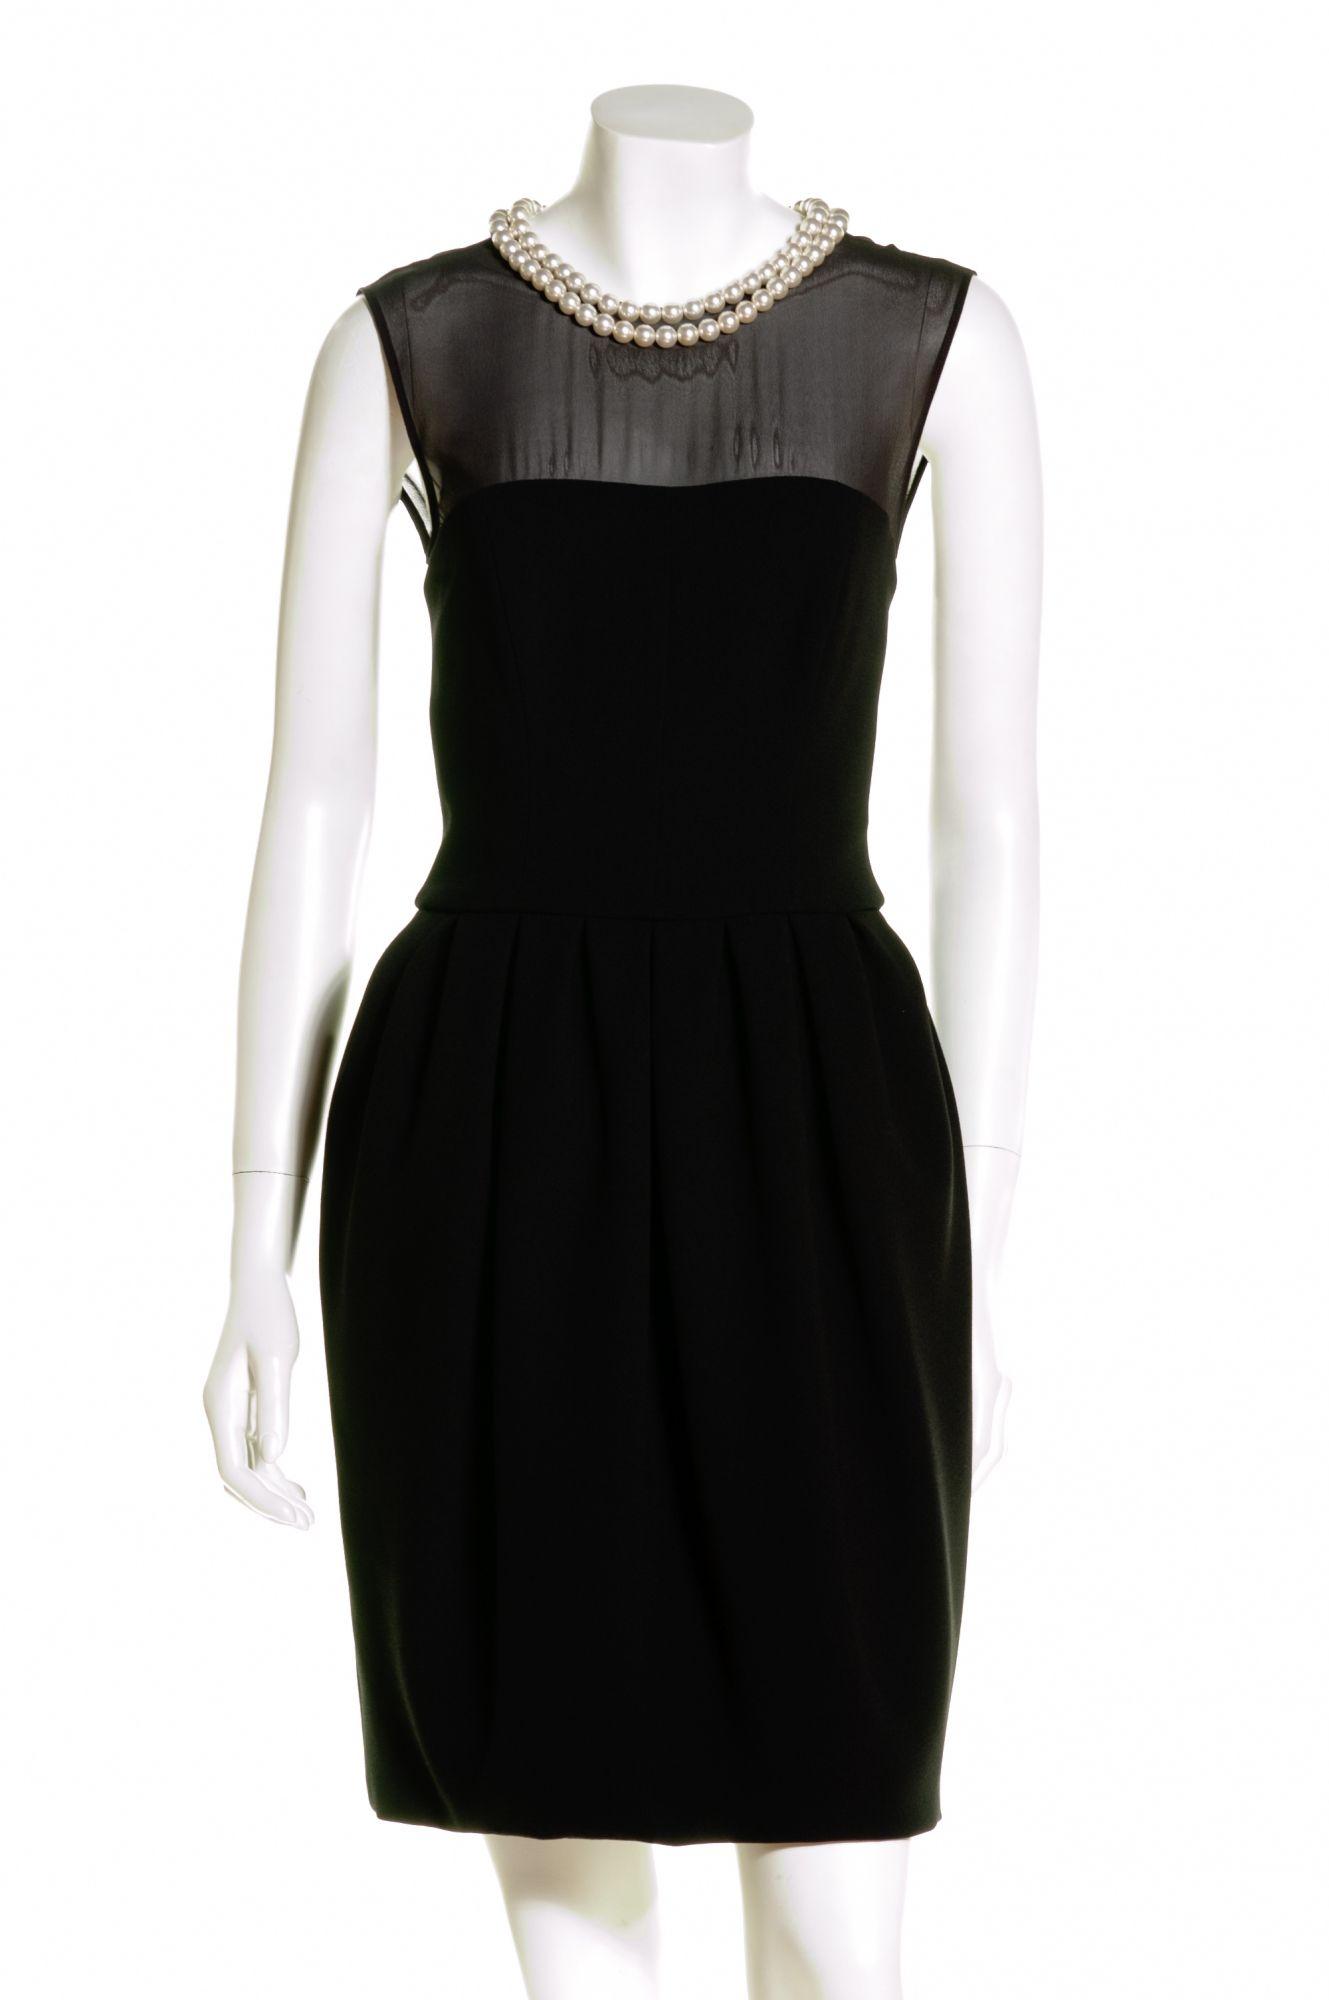 Pearl Embellished Black Dress Black Dress Perfect Little Black Dress Dresses [ 2000 x 1329 Pixel ]